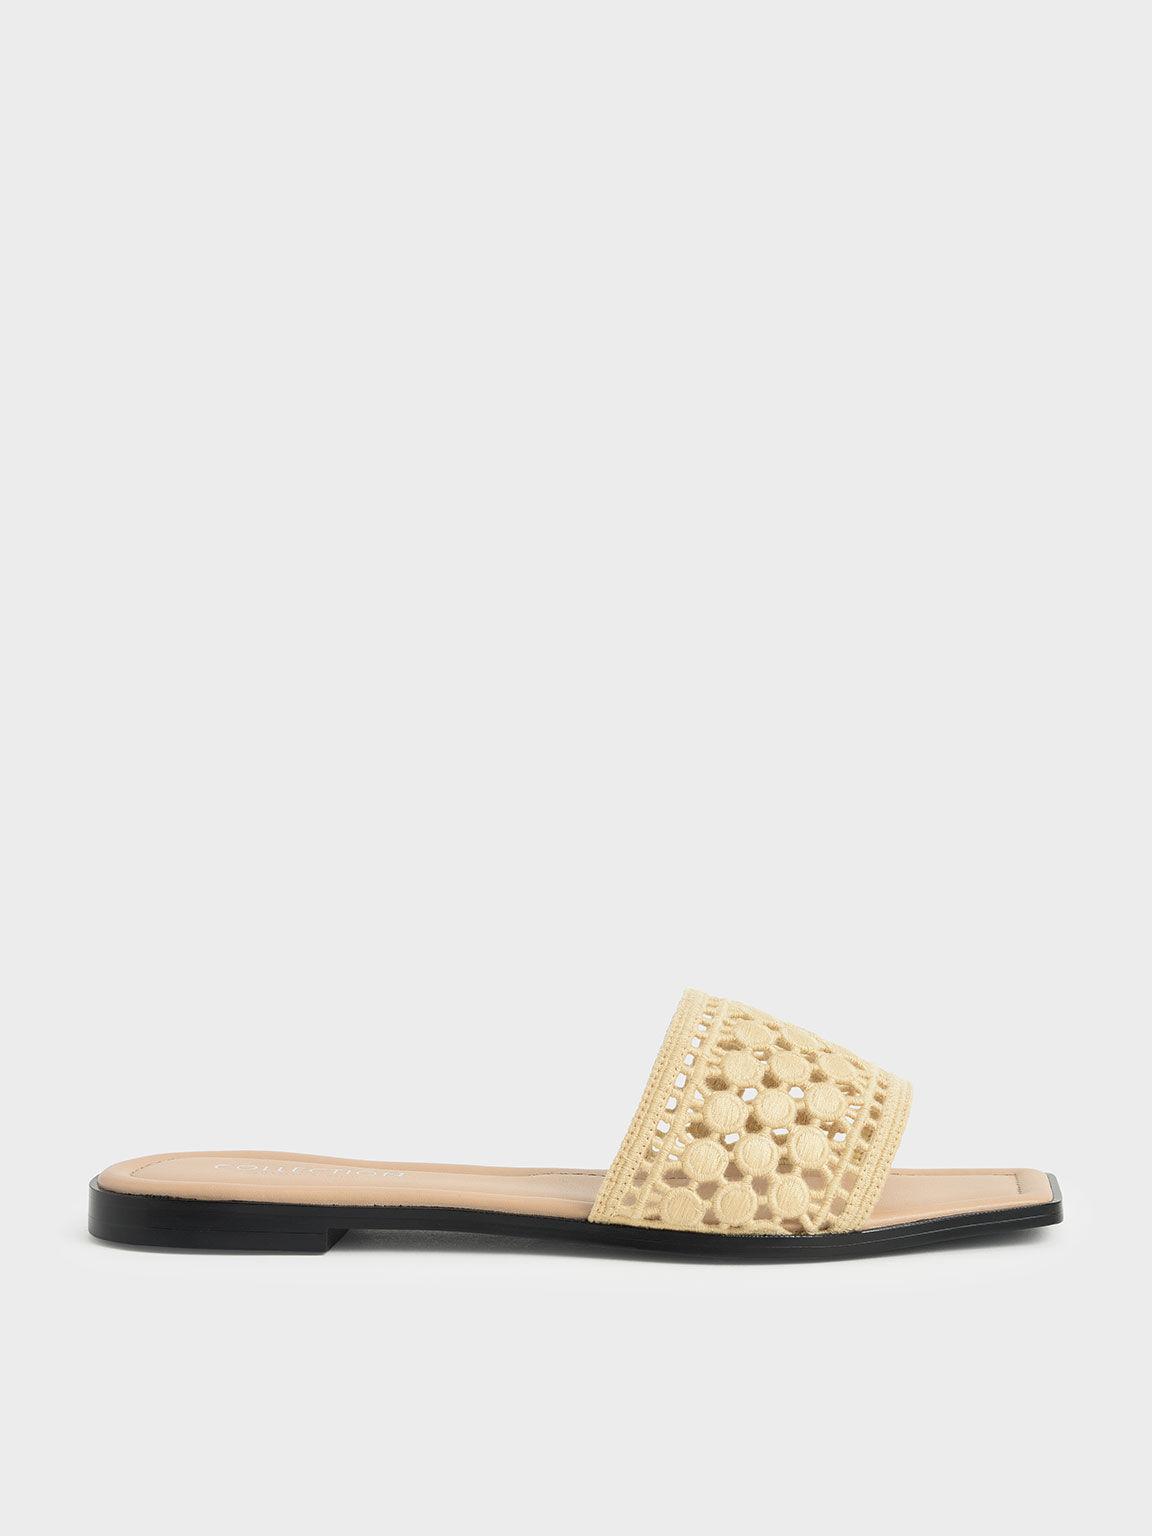 Asymmetrical Toe Crochet Slides, Yellow, hi-res